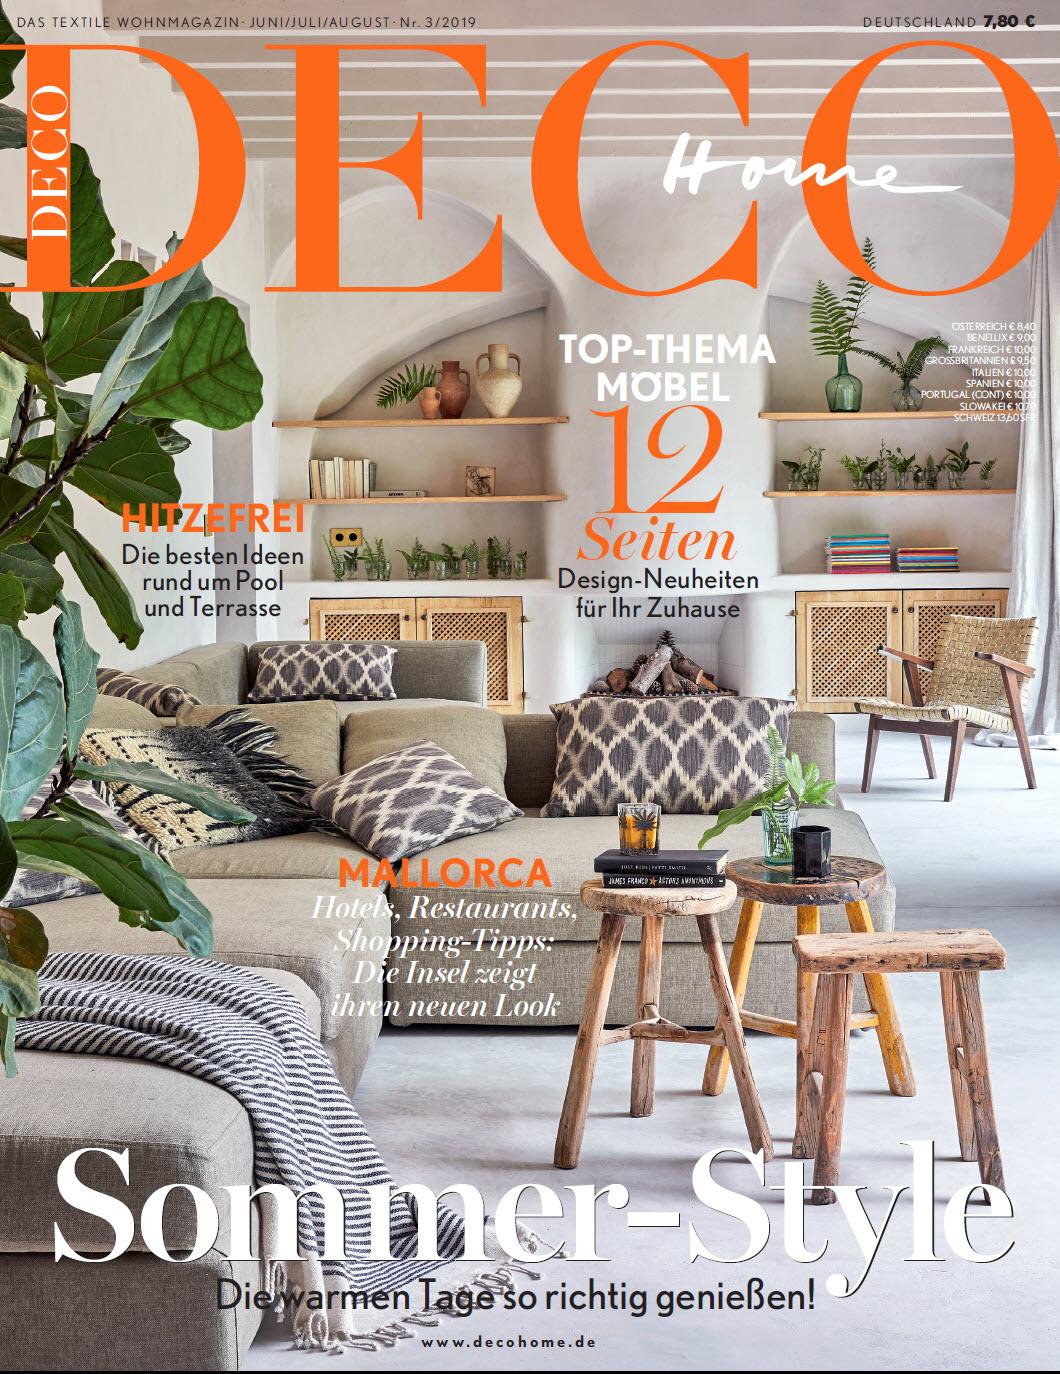 DECO HOME COVER.jpg